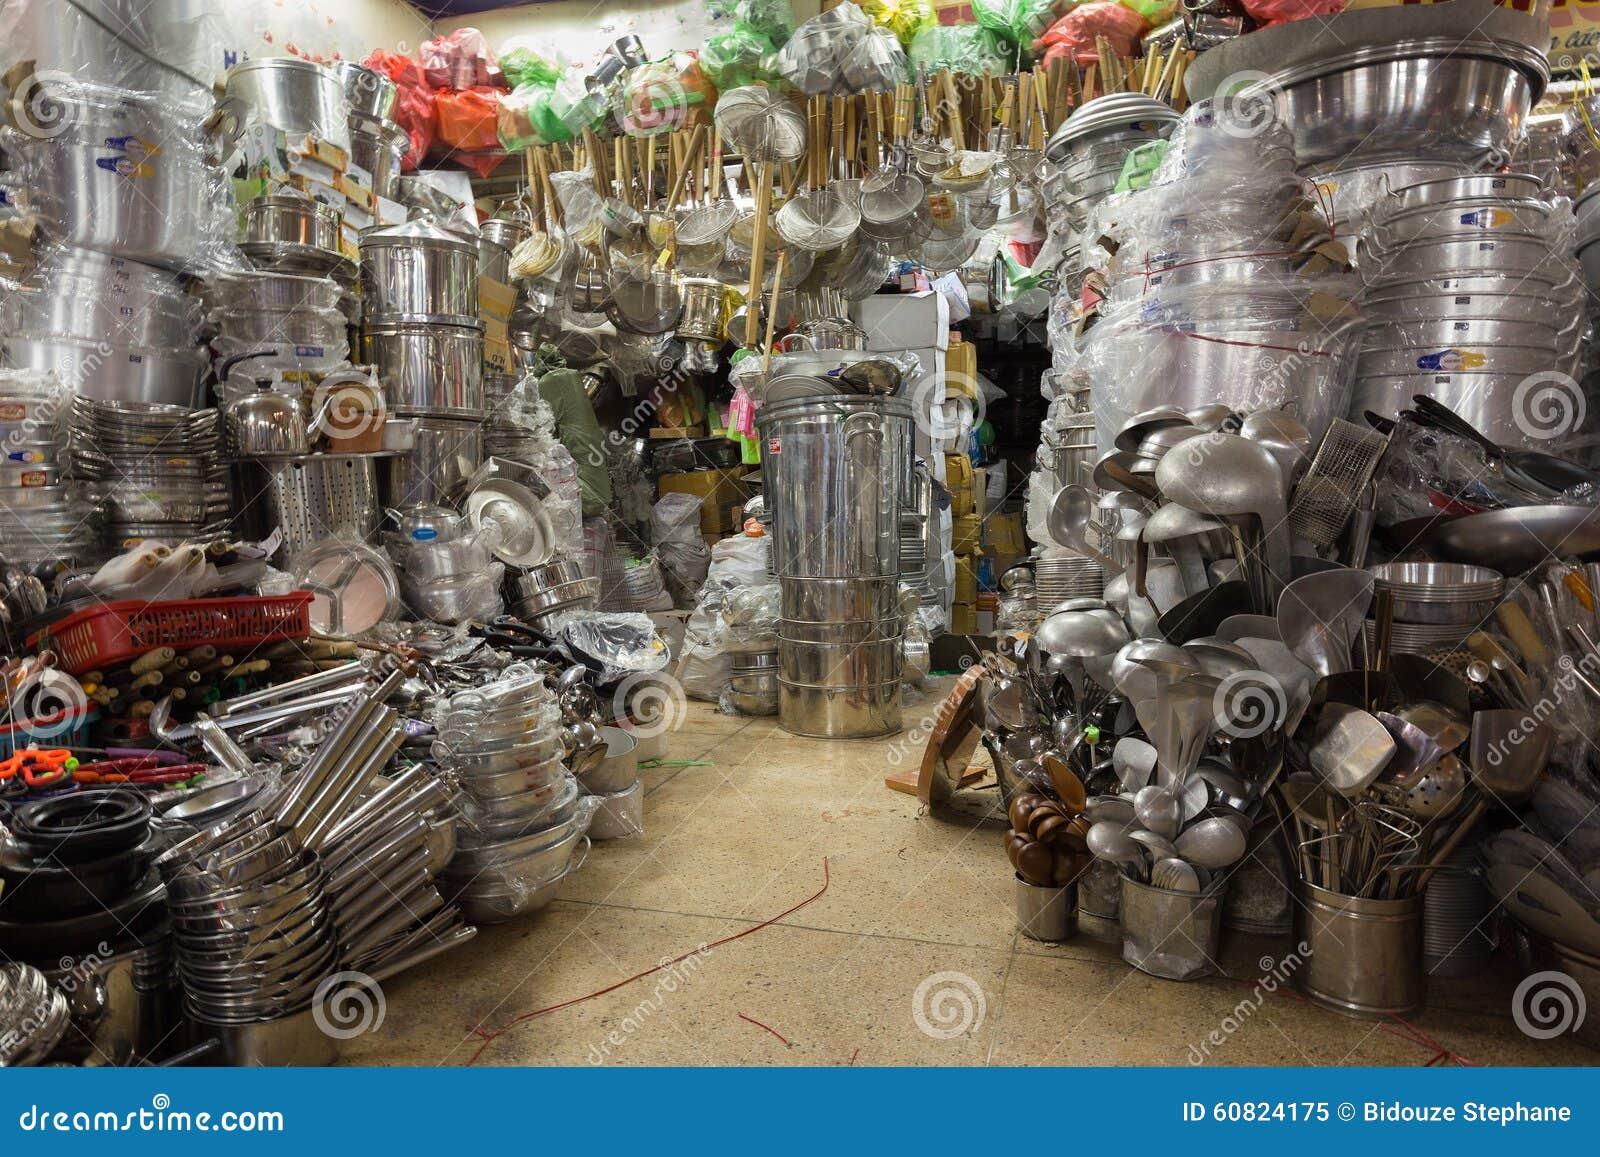 kitchen utensils asian shop stock photo